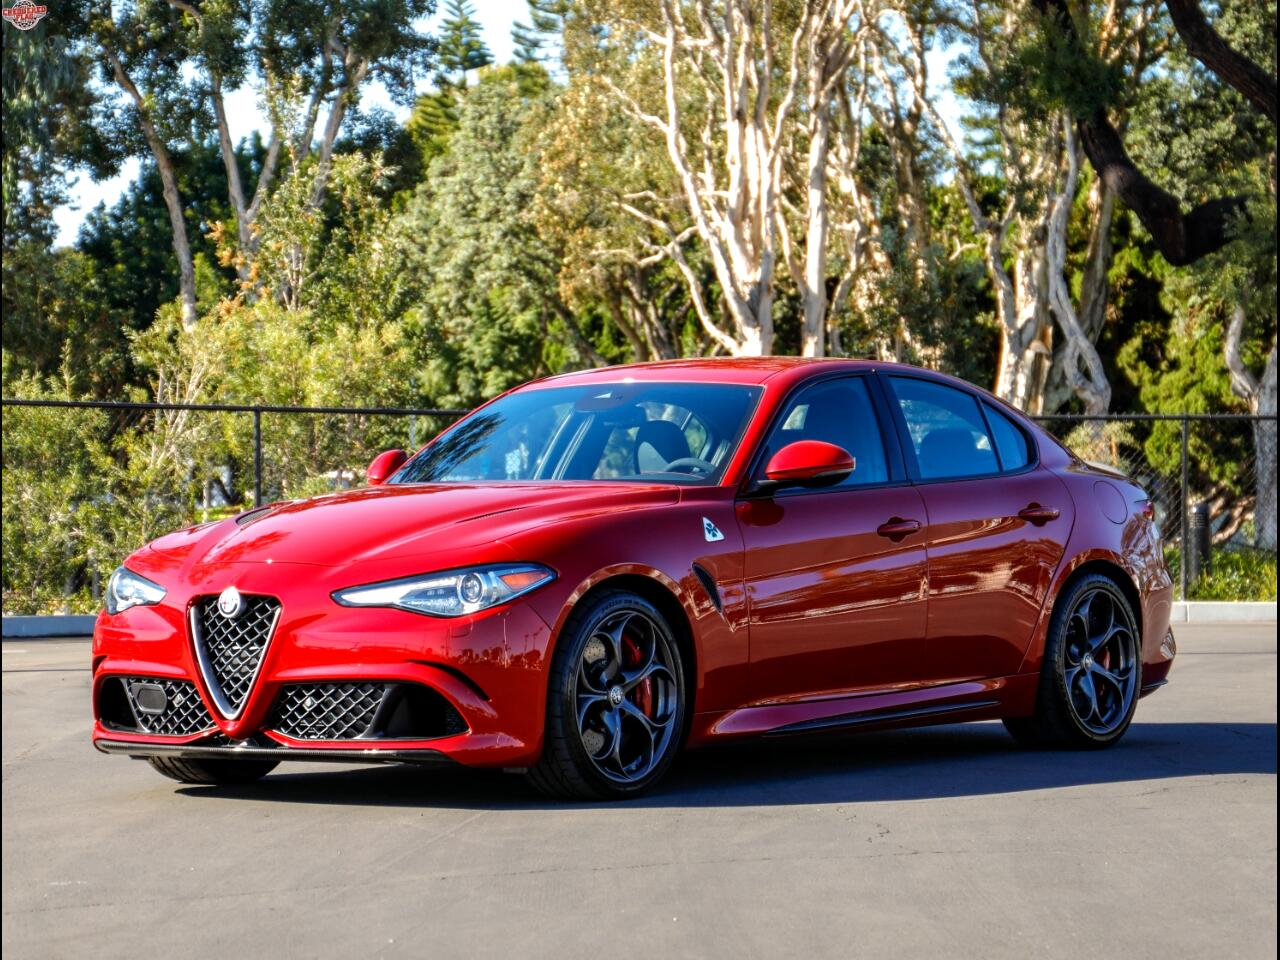 Alfa Romeo Giulia Quadrifoglio RWD 2017